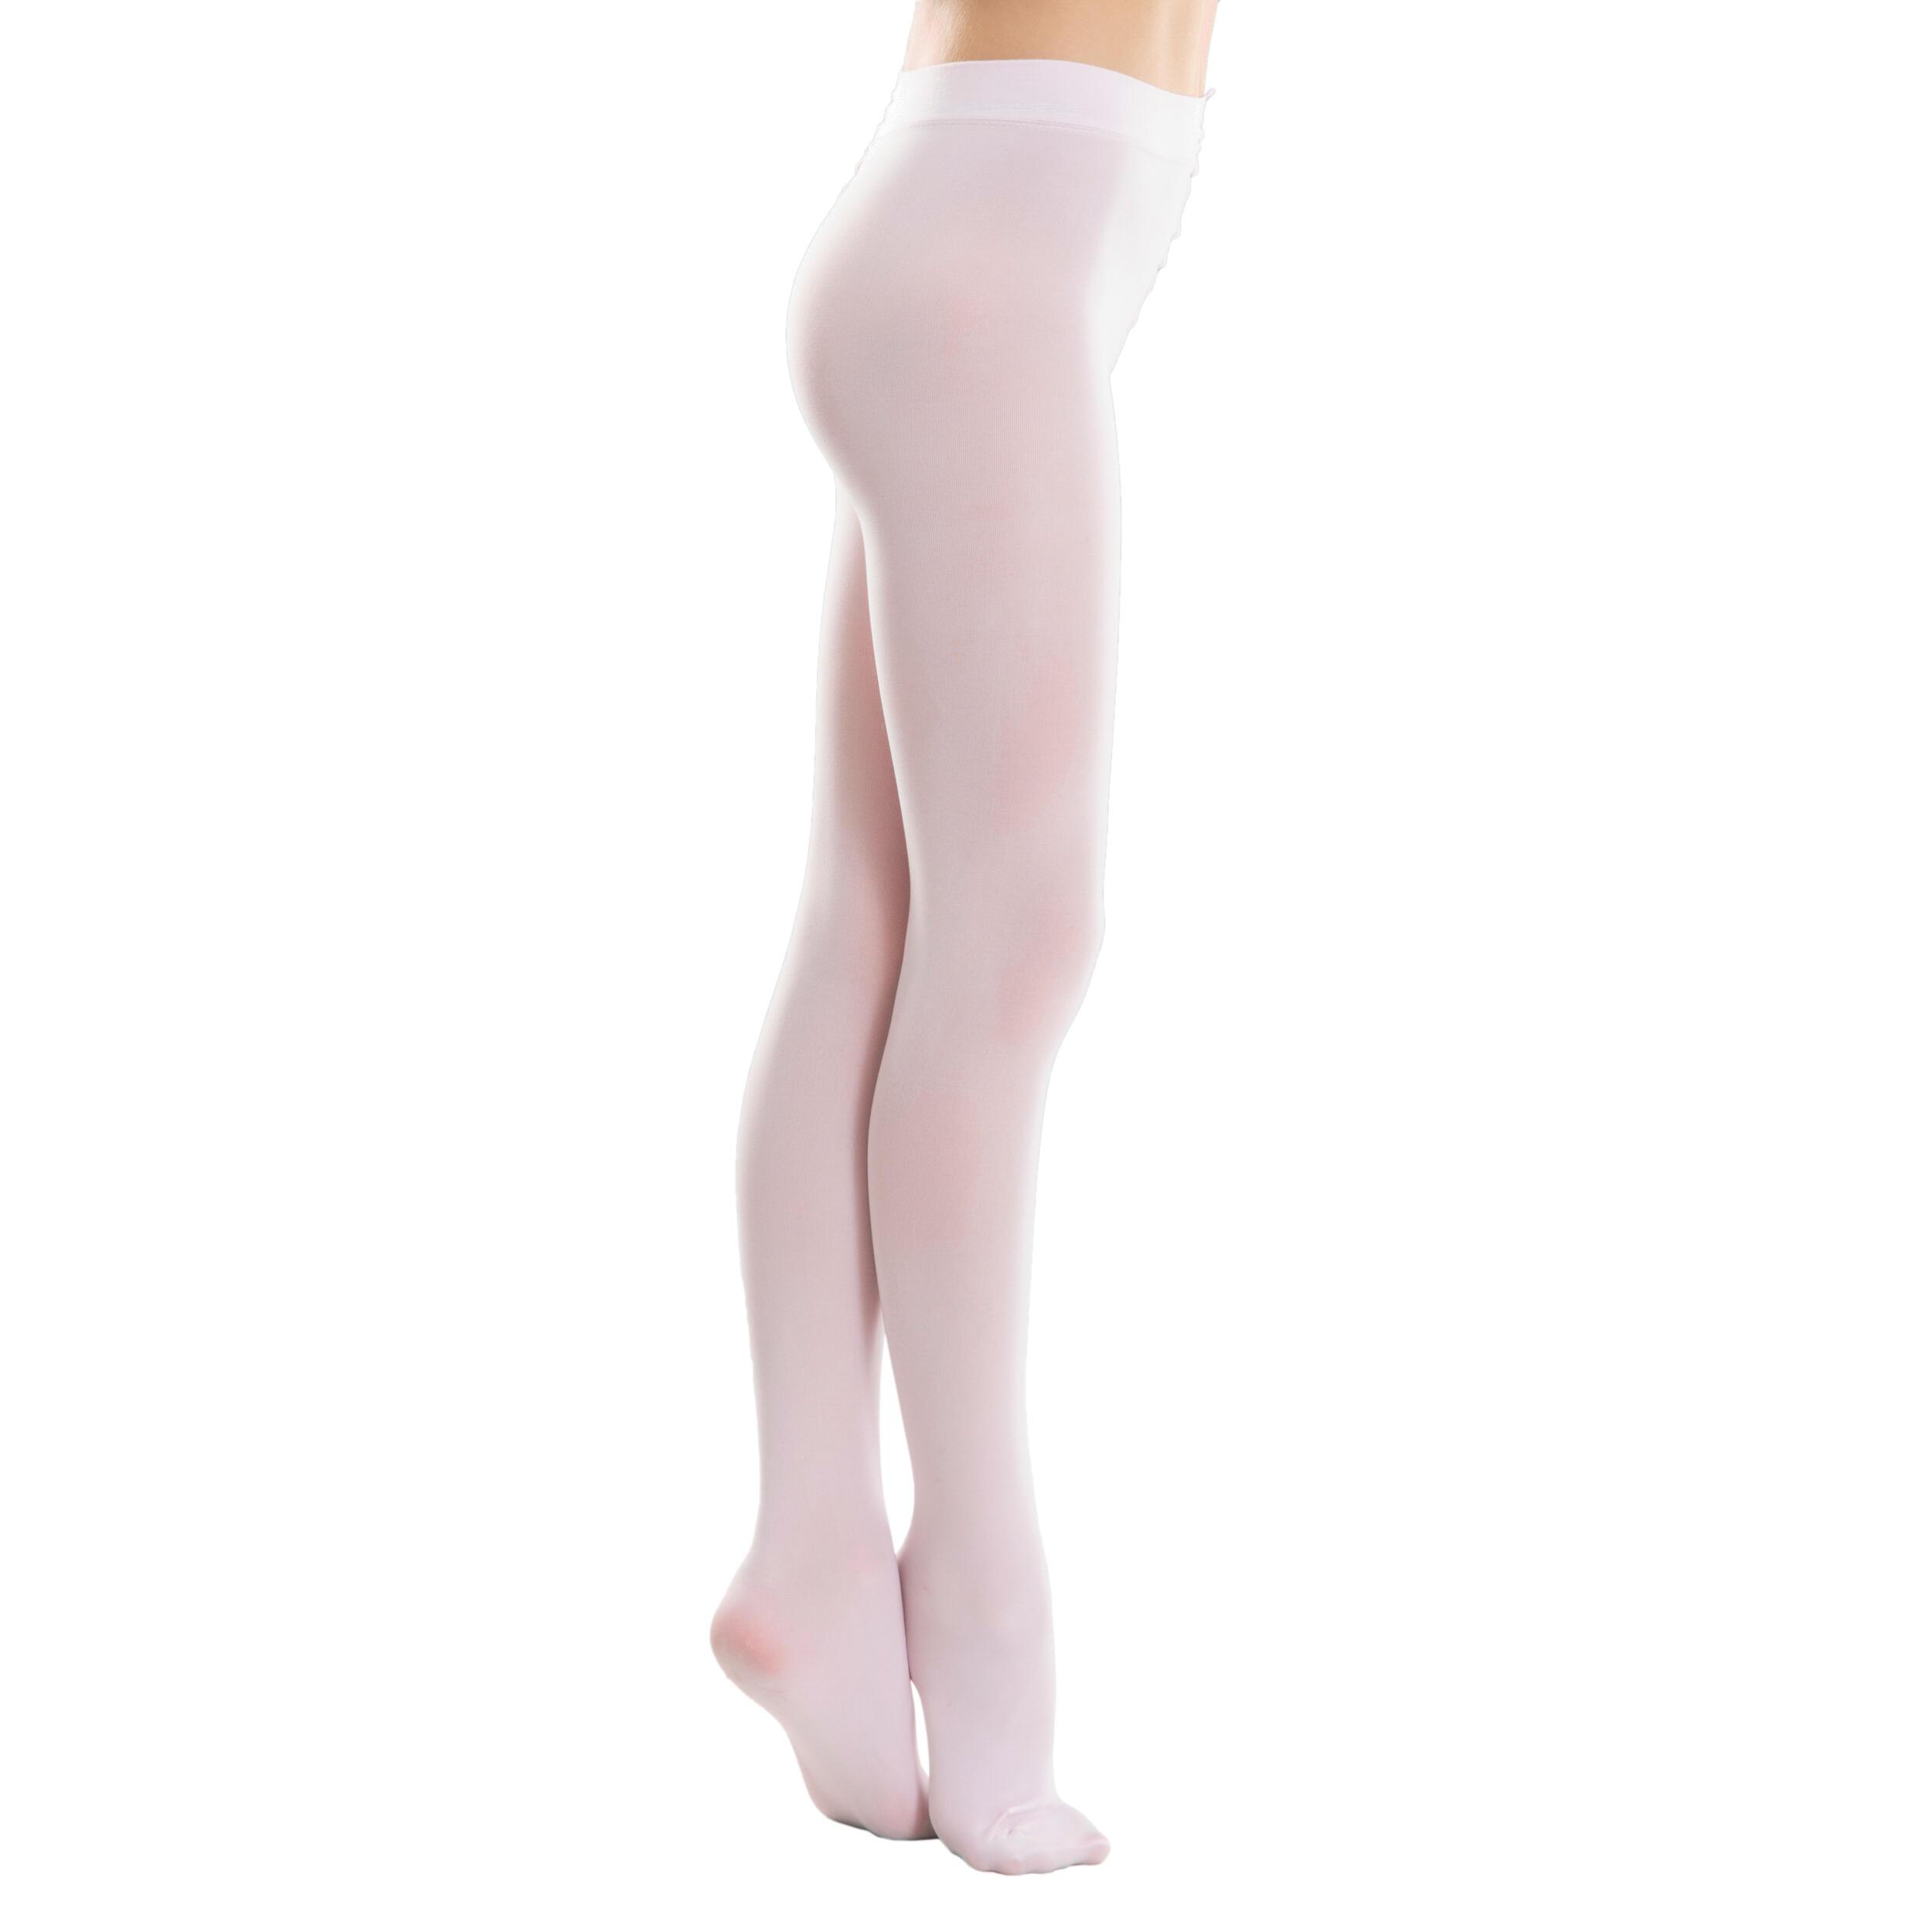 Ballettstrumpfhose Damen rosa | Unterwäsche & Reizwäsche > Strumpfhosen > Strumpfhosen | Domyos